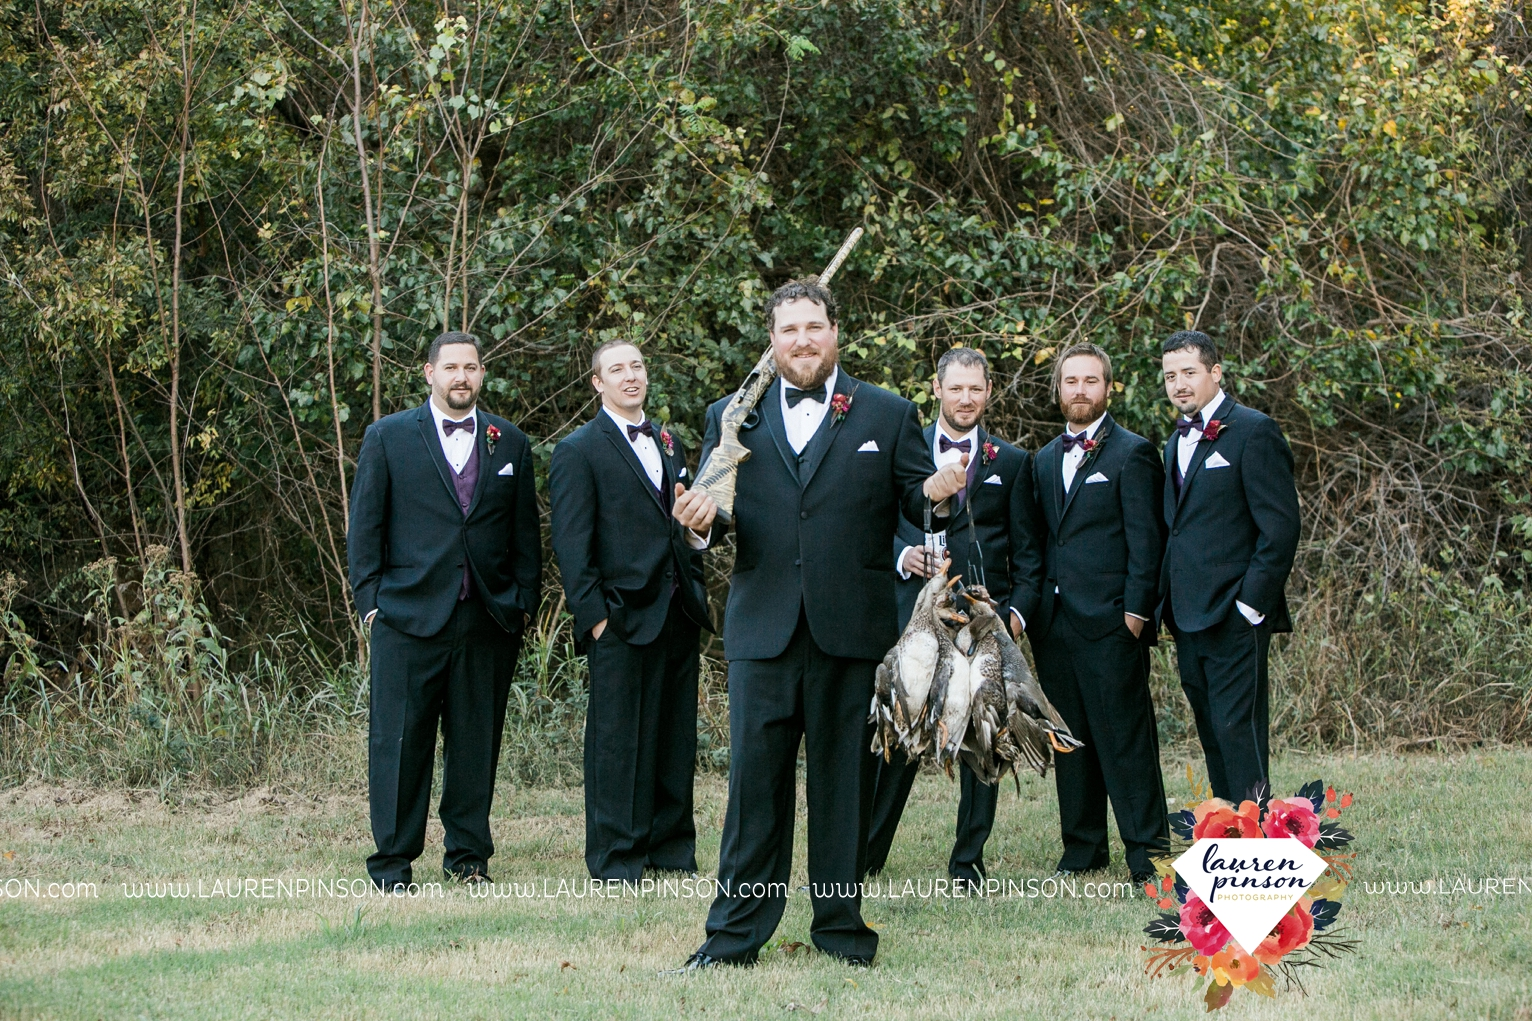 rustic-wichita-falls-texas-wedding-photographer-gold-glam-mayfield-events-market-street-united-allue-bridals-fall_1760.jpg